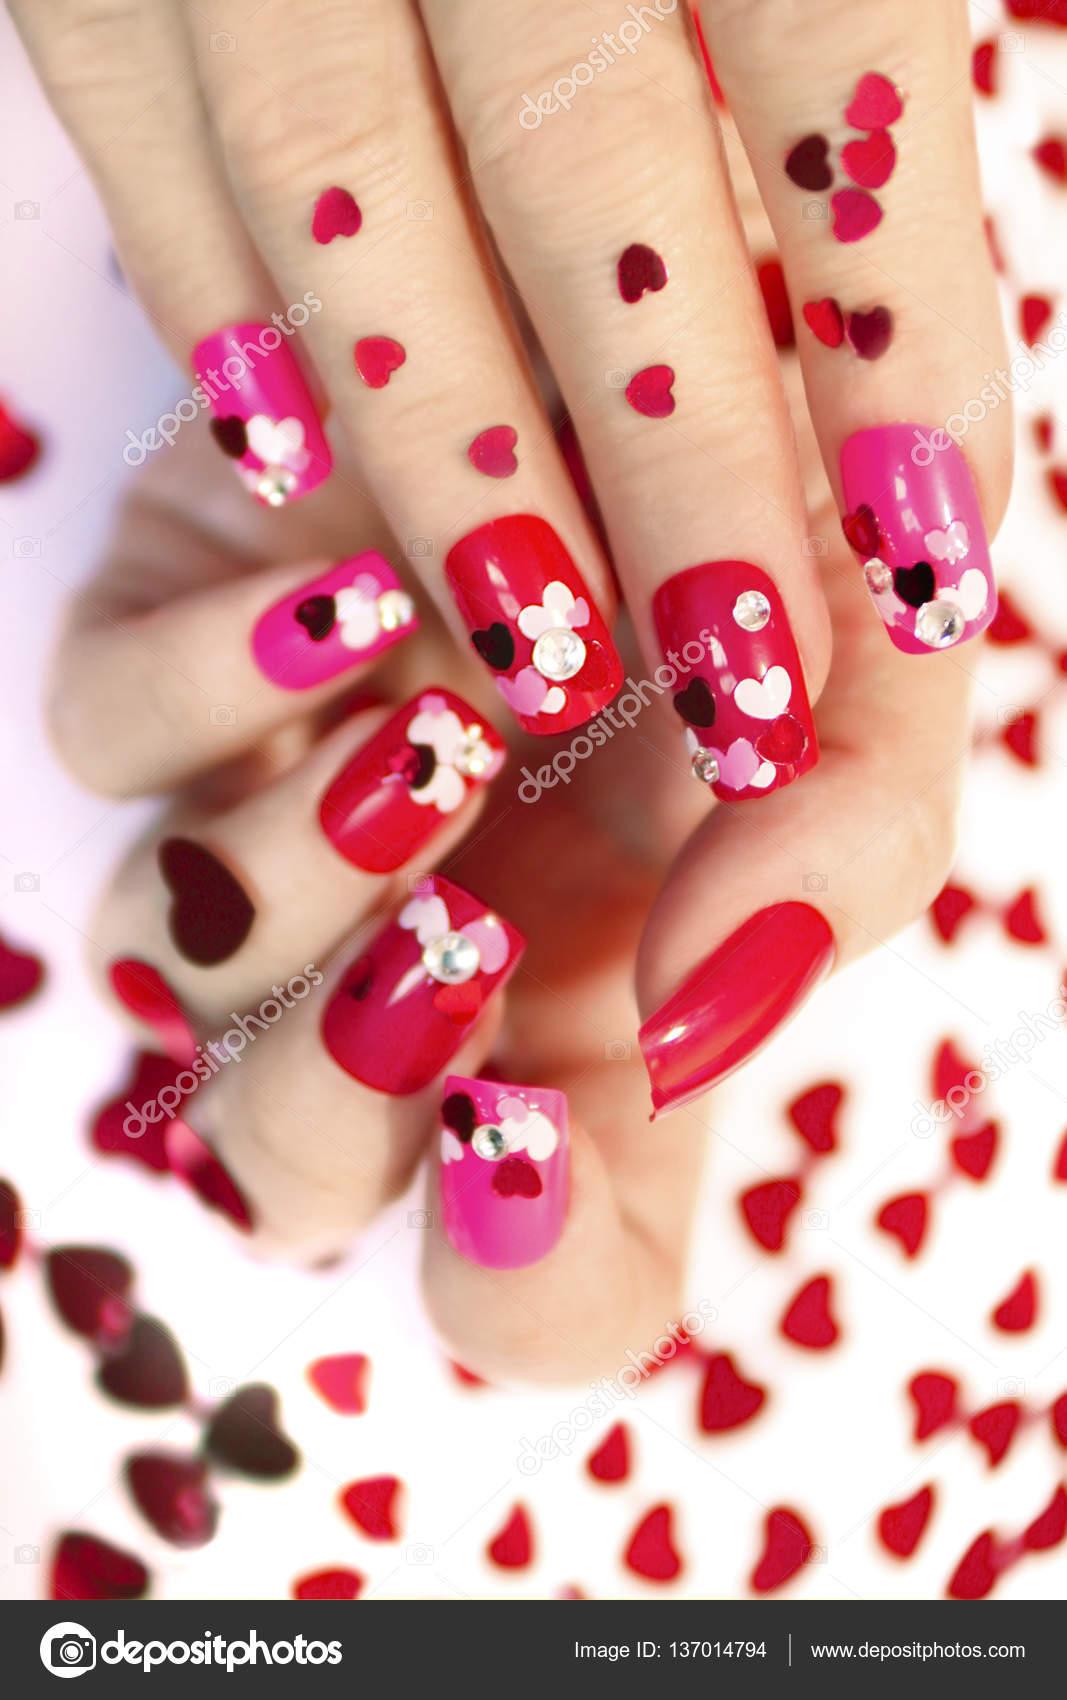 Nail Designs With Hearts Stock Photo Marigo 137014794